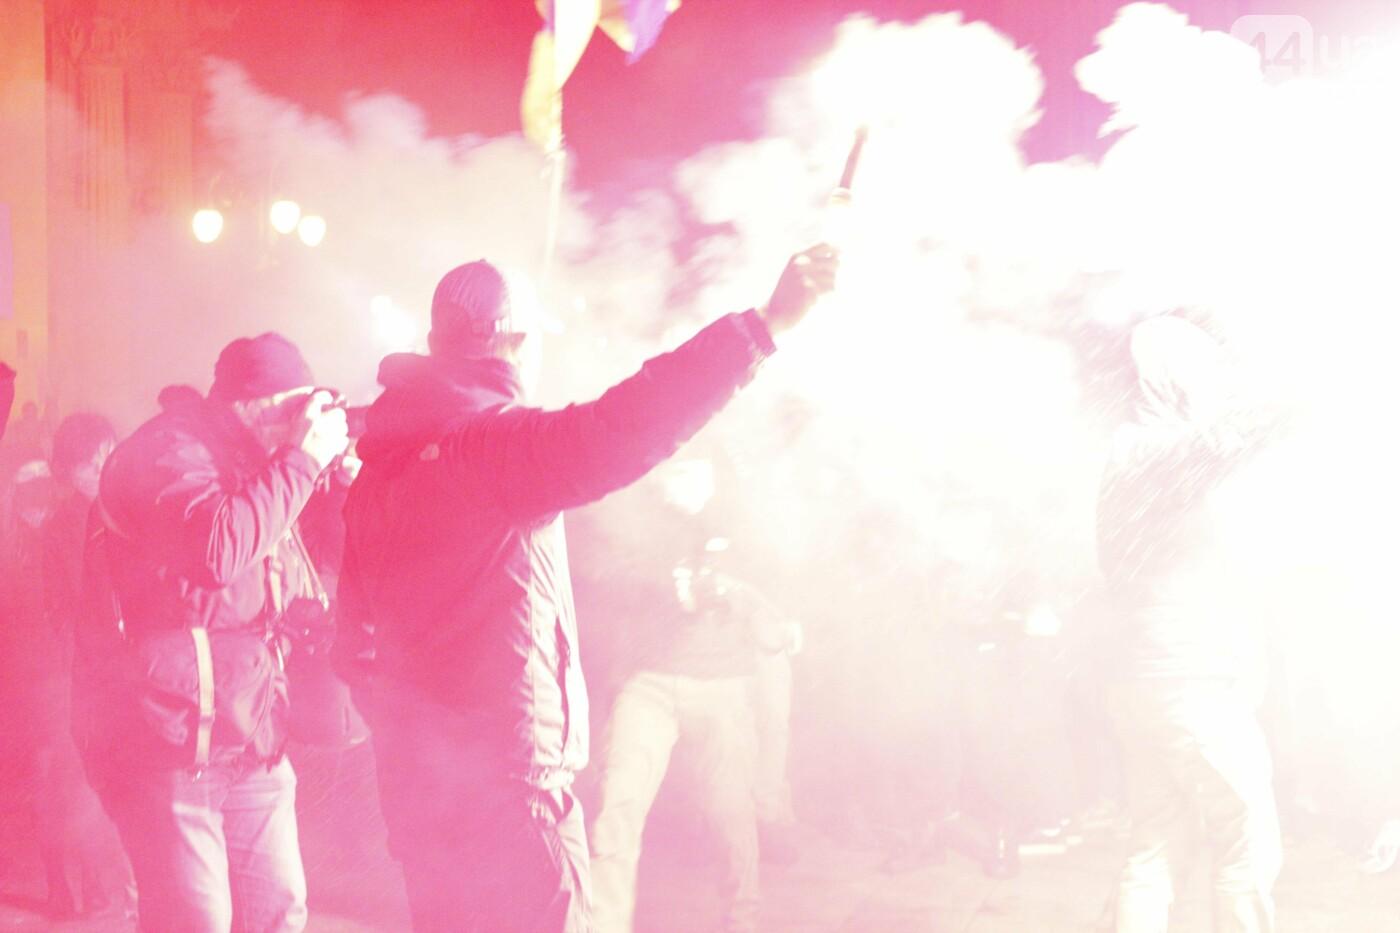 Сожгли табличку и разбили окна: акция в поддержку Стерненко переросла в беспорядки, - ФОТО, фото-13, Фото: 44.ua